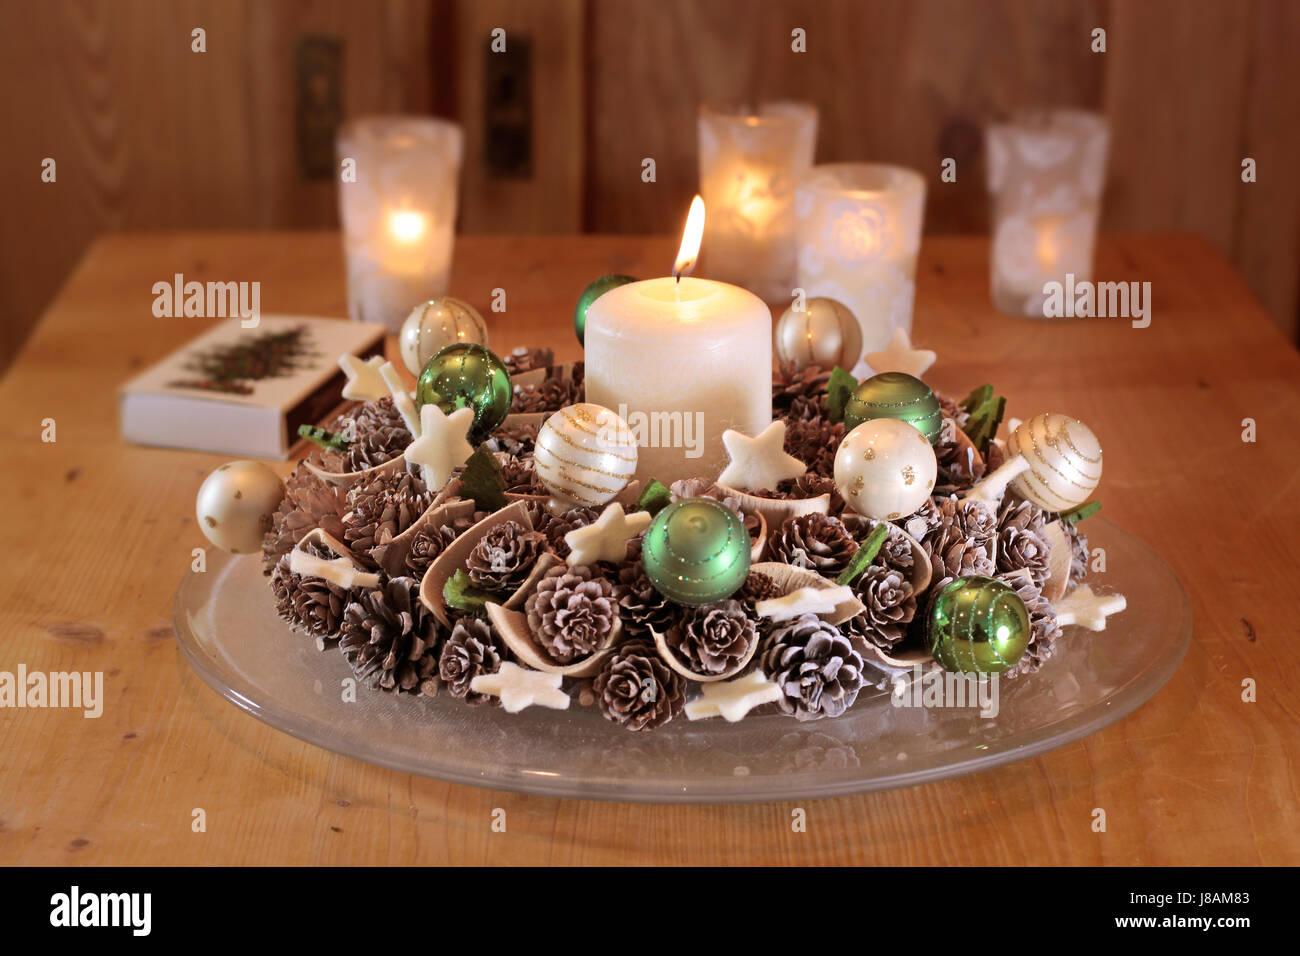 Wood Advent Decoration Christmas Decorations Advent Wreath Stock Photo Alamy